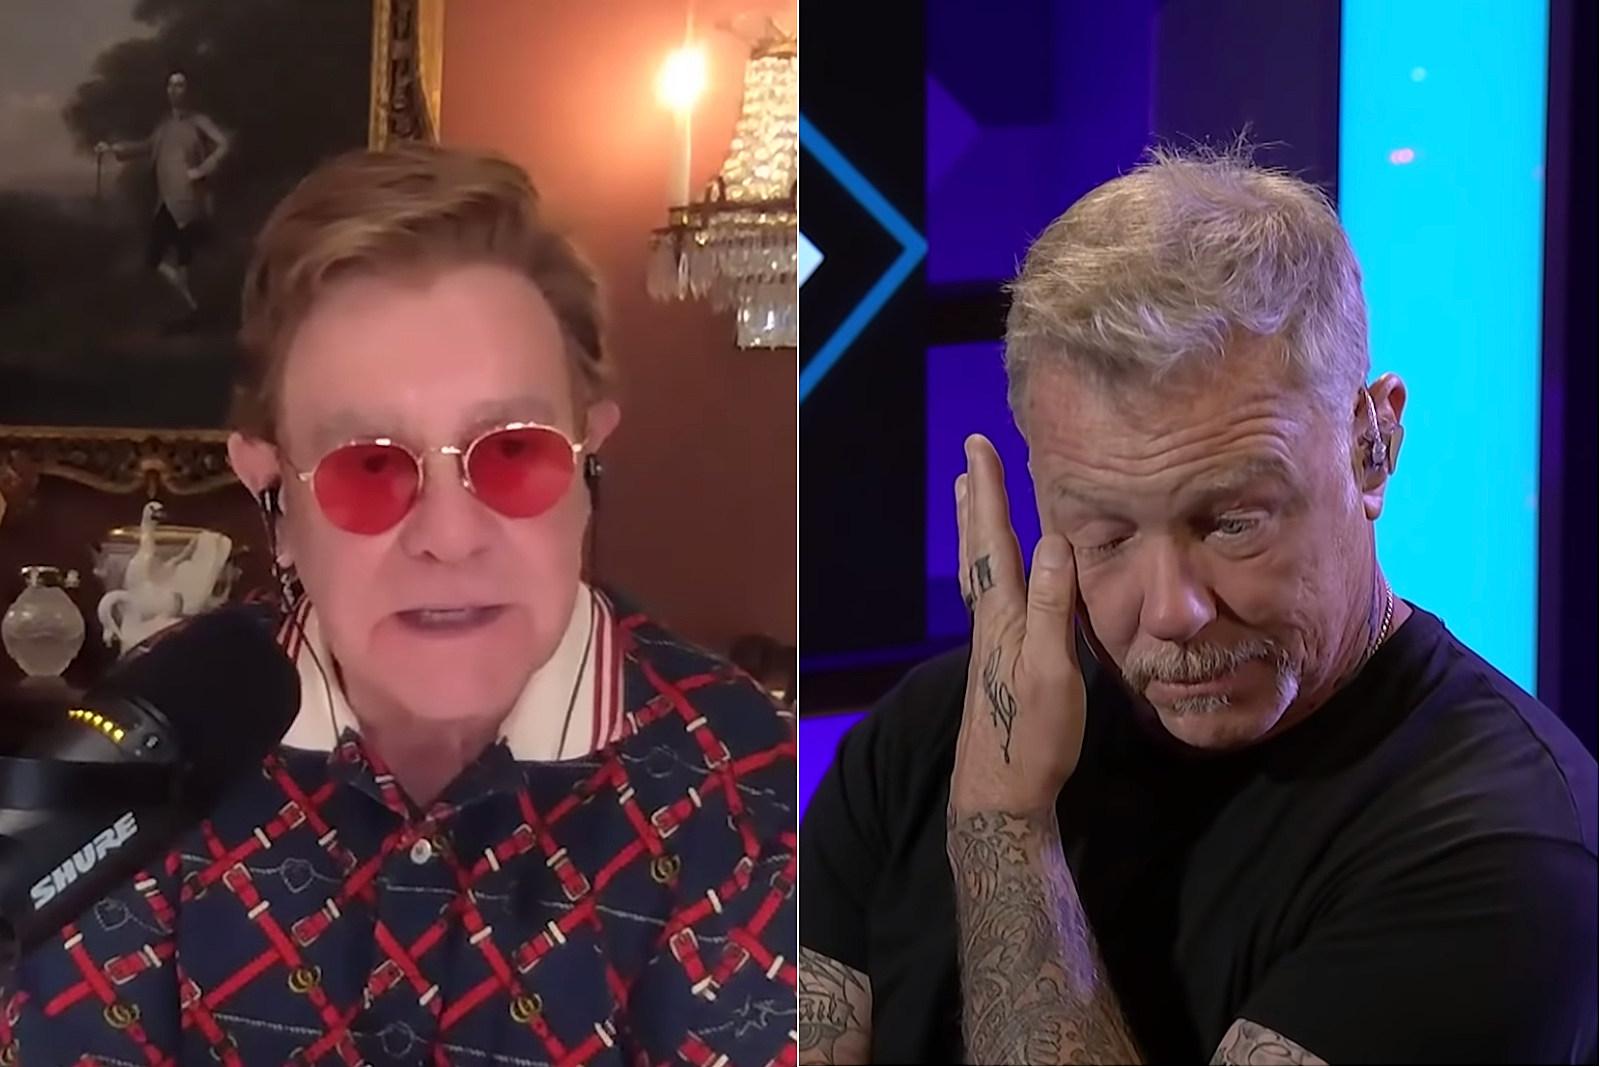 James Hetfield Moved to Tears by Elton John's Praise